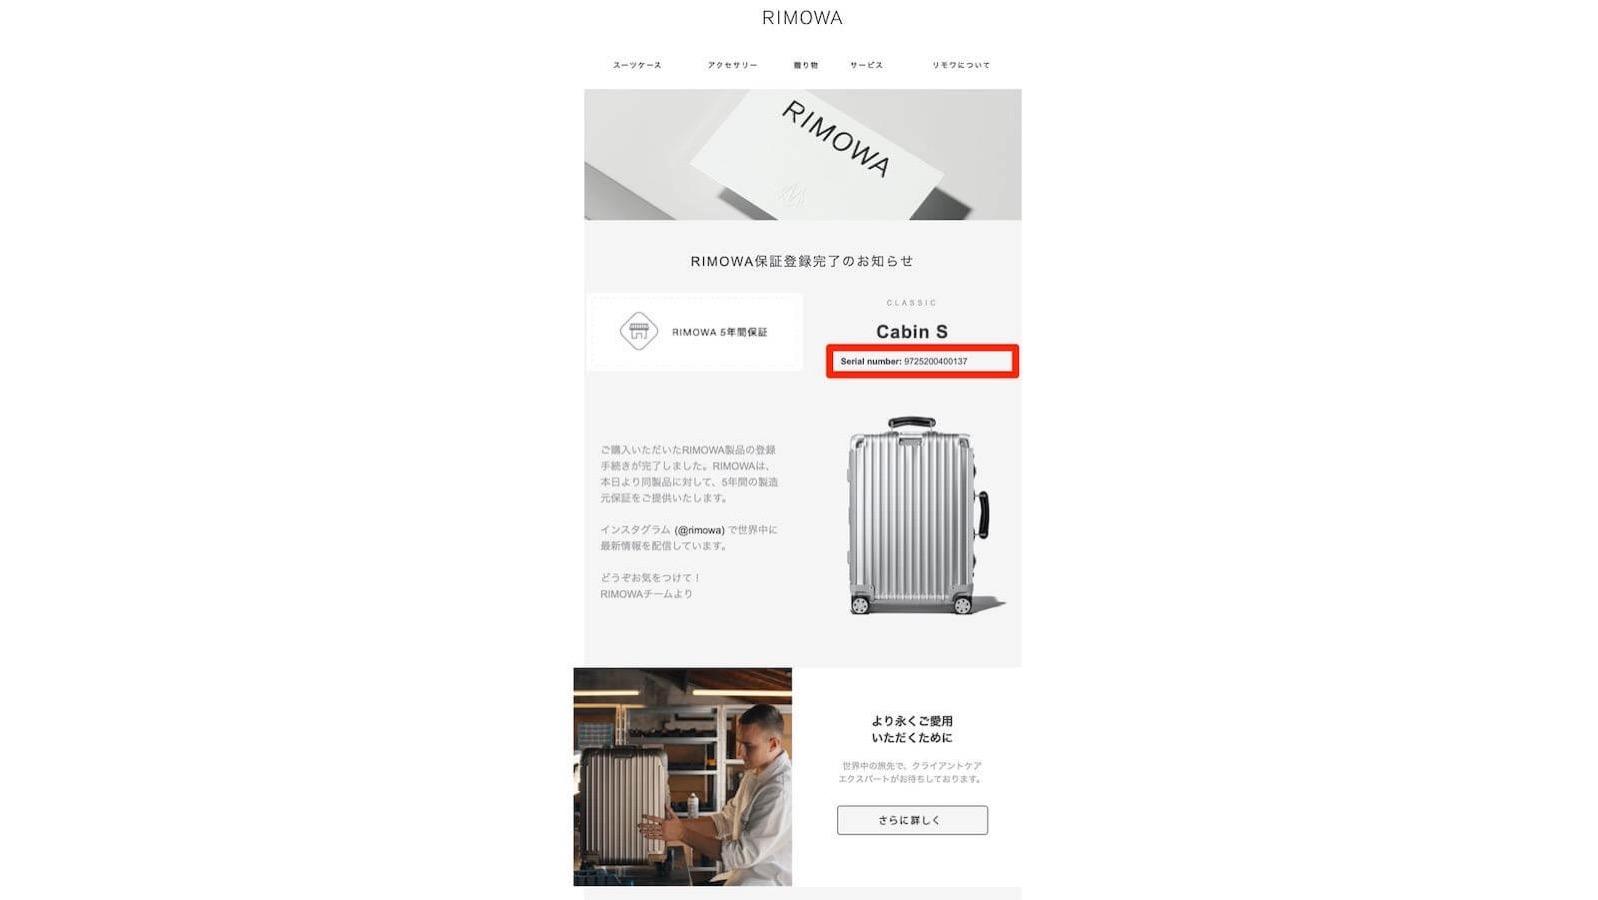 0229 Rimowa online registration method 18